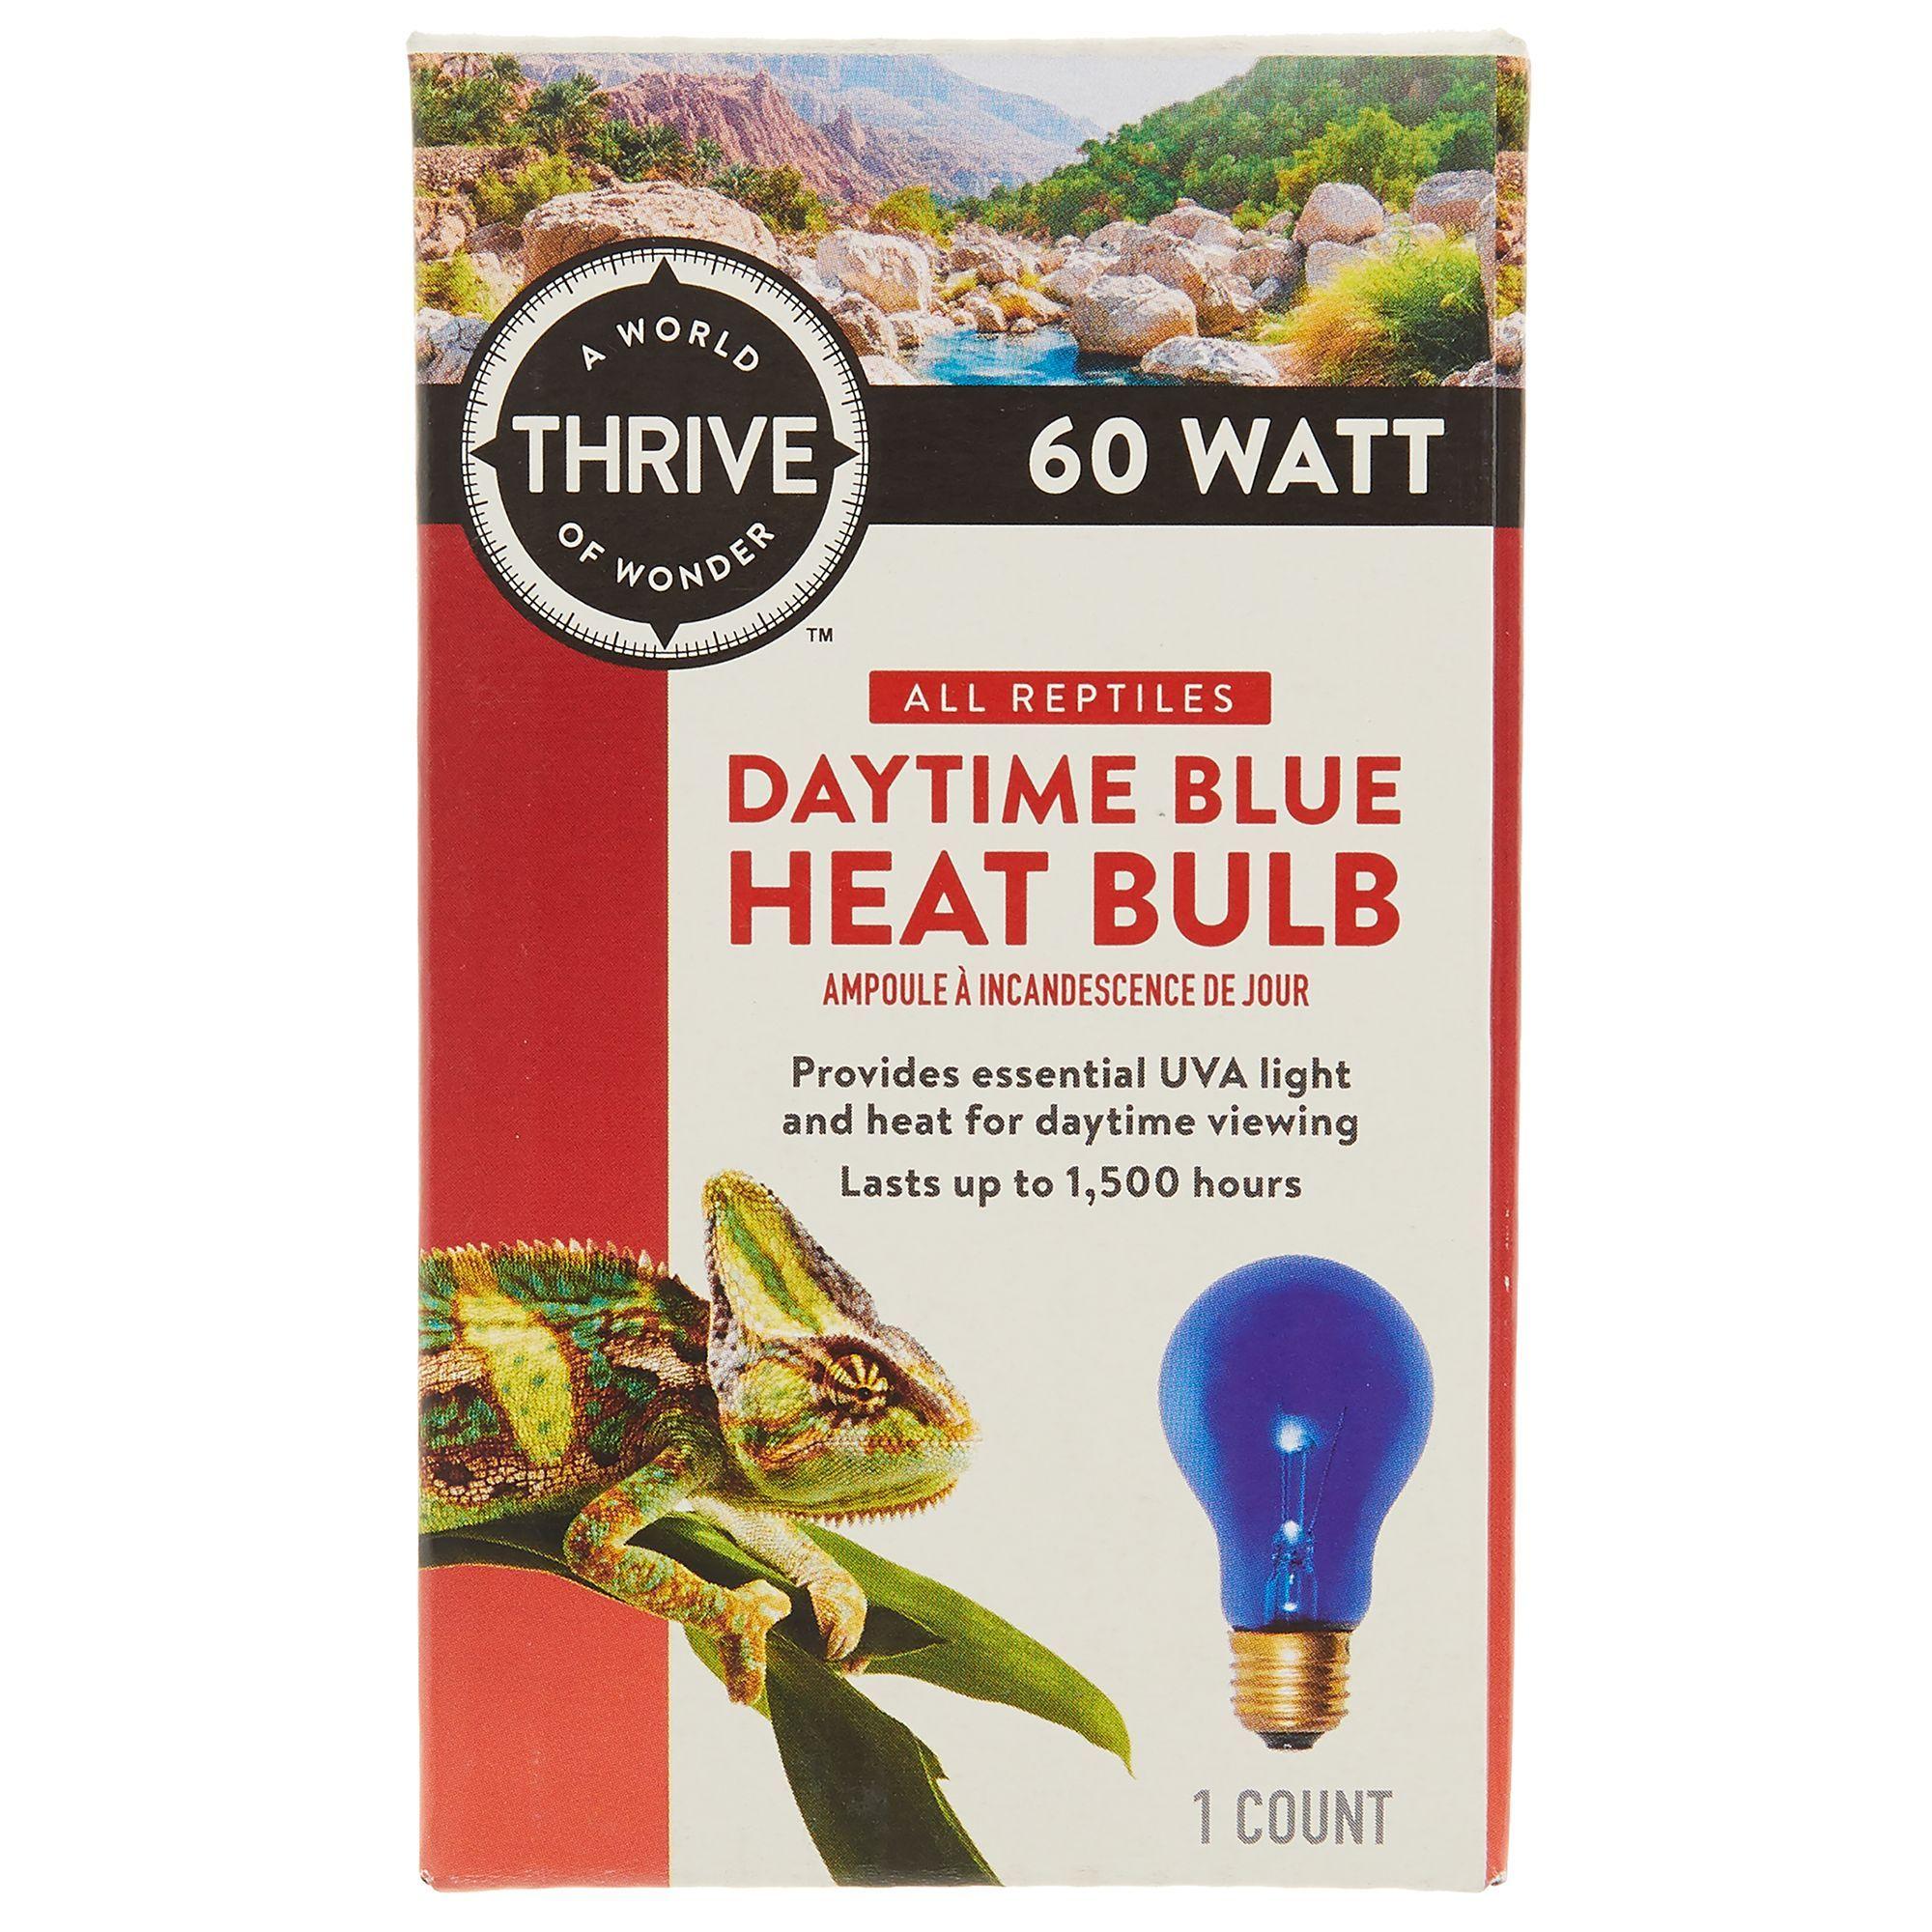 Thrive Daytime Blue Reptile Heat Bulb